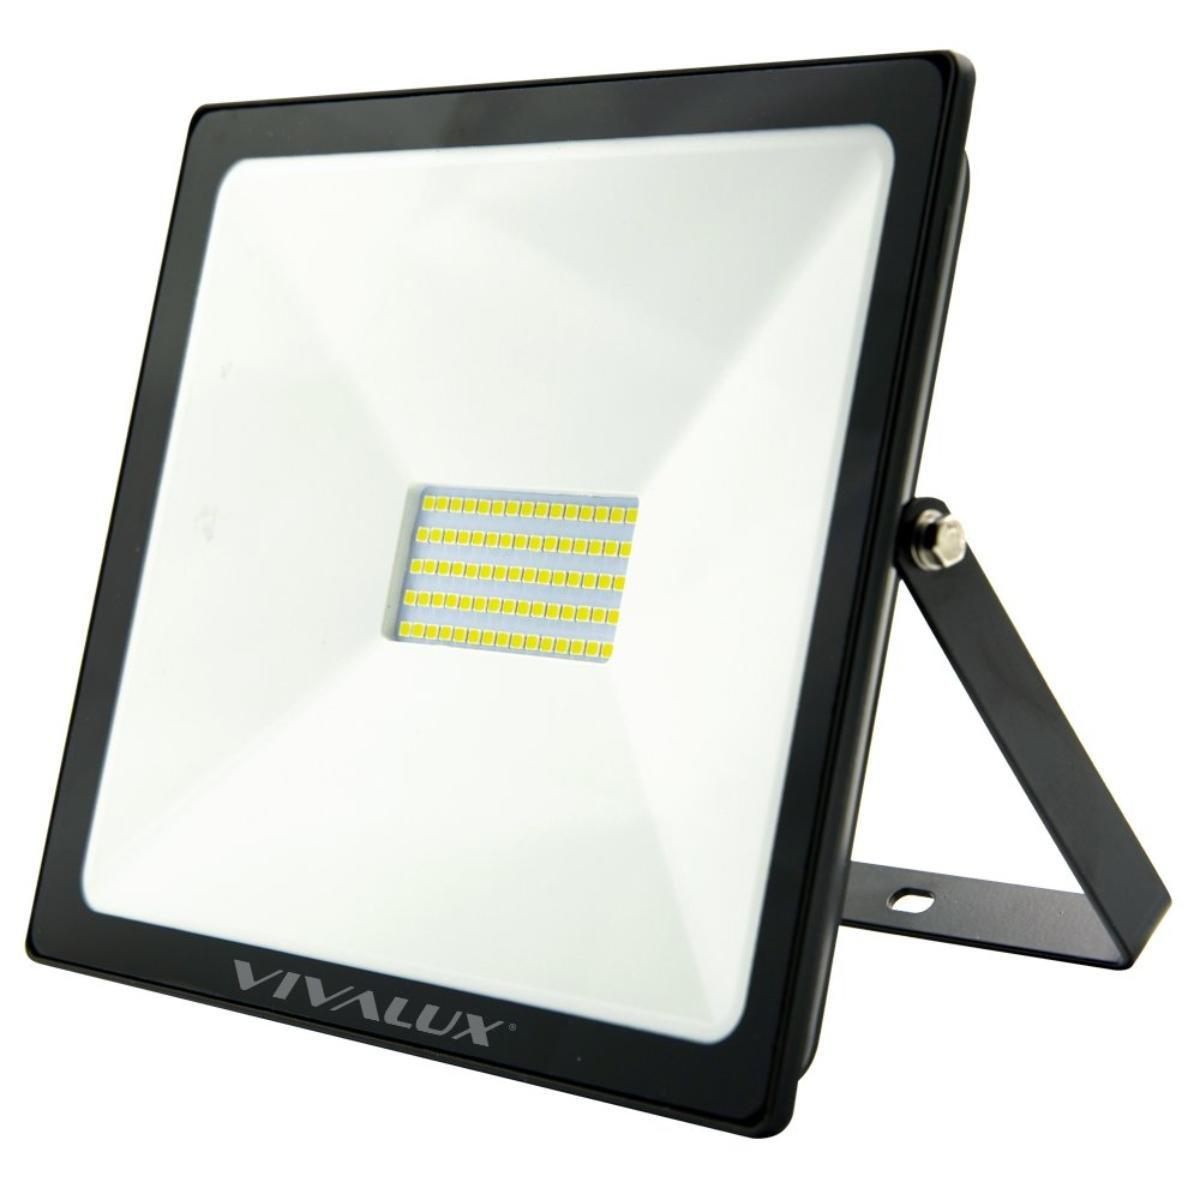 LED ПРОЖЕКТОР, 230V, IP65, 50W/B 4000K